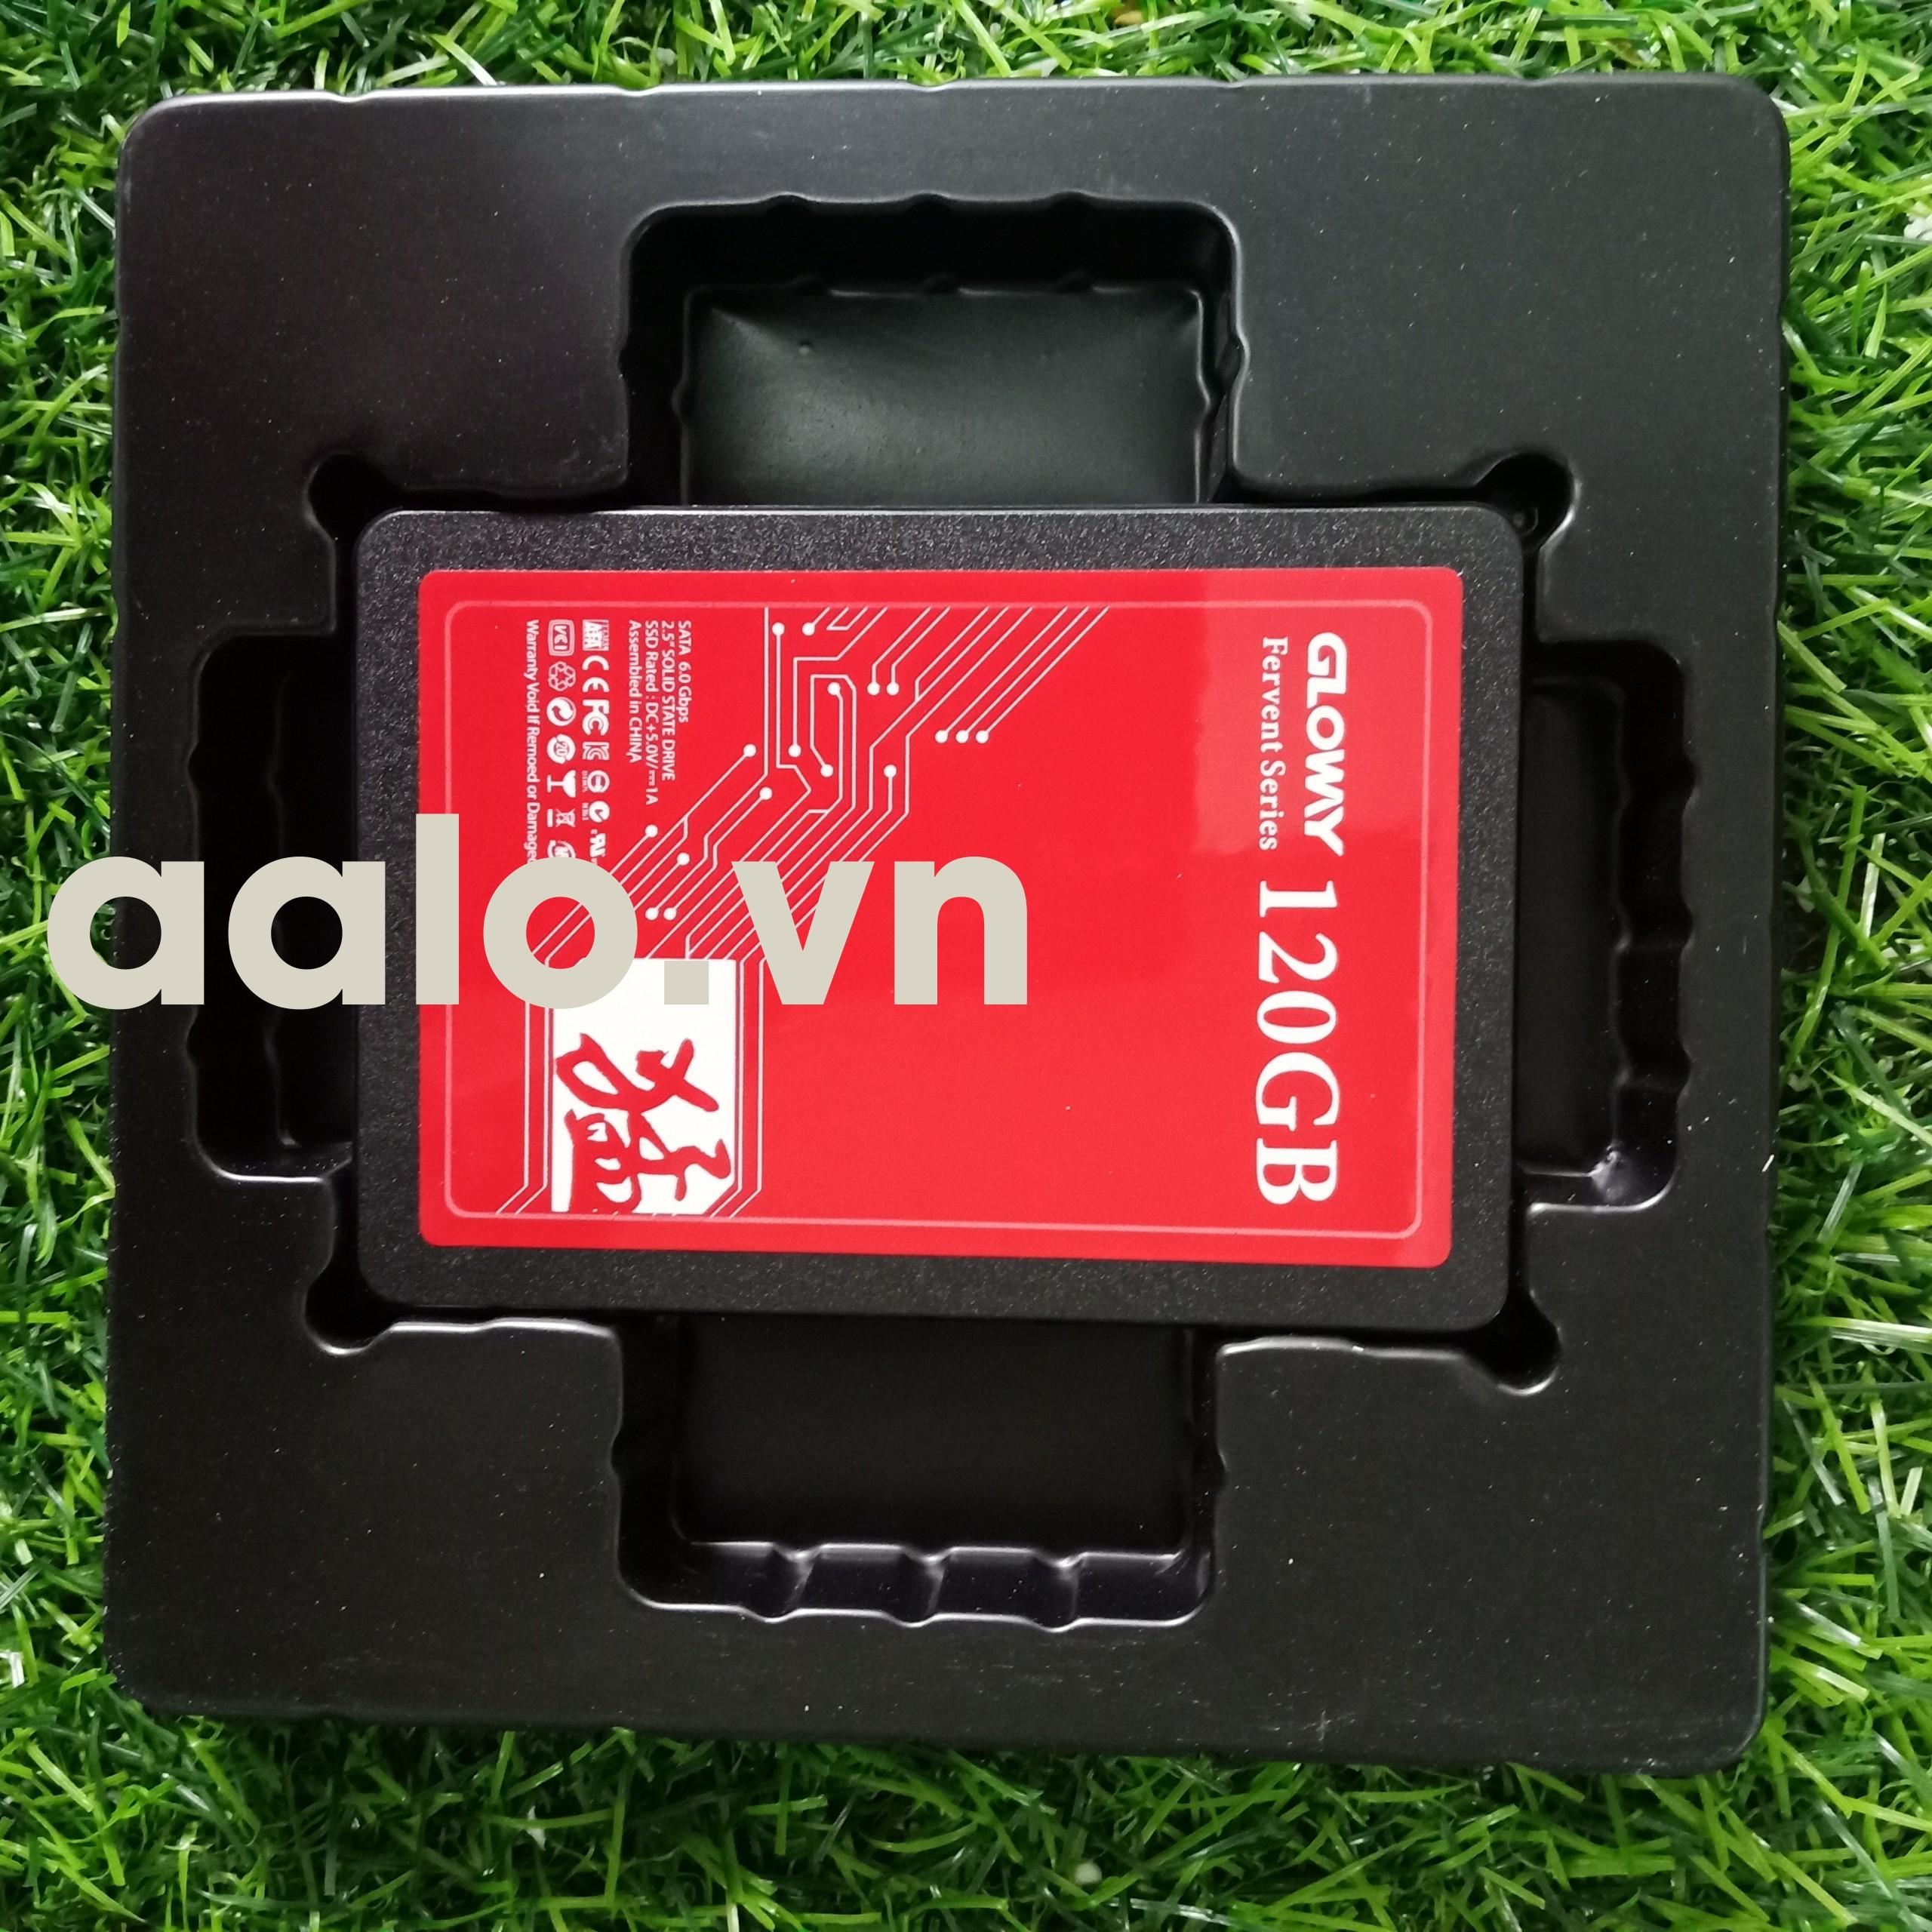 Ổ cứng SSD Gloway 120GB S3-S7 SATA3 6Gb 2.5